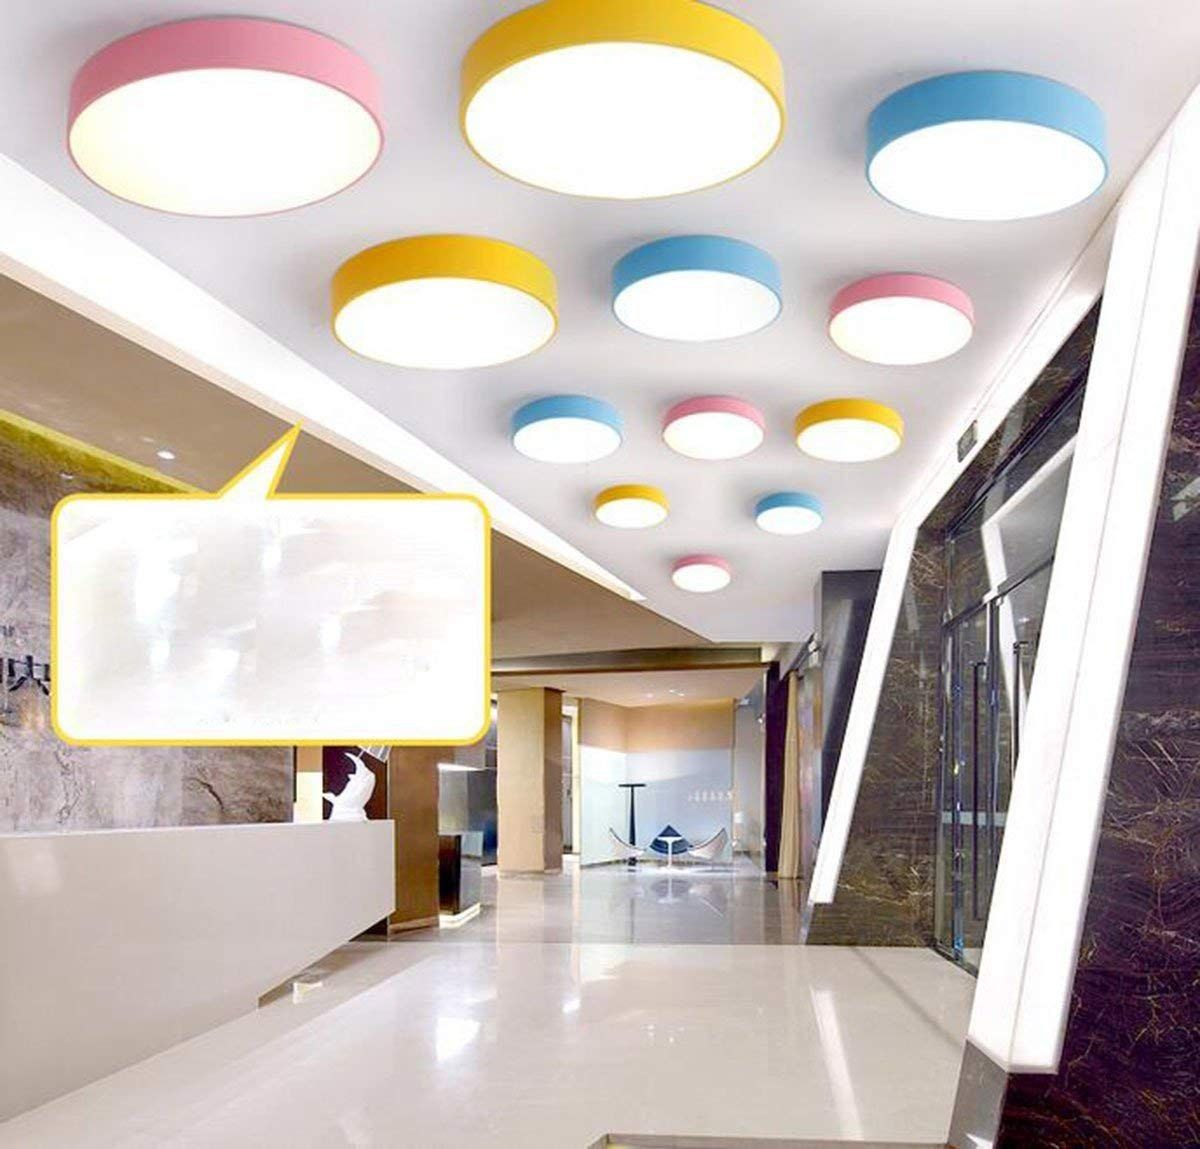 Moderne Deckenleuchte LED Deckenlampe Kinder Lampe, runde